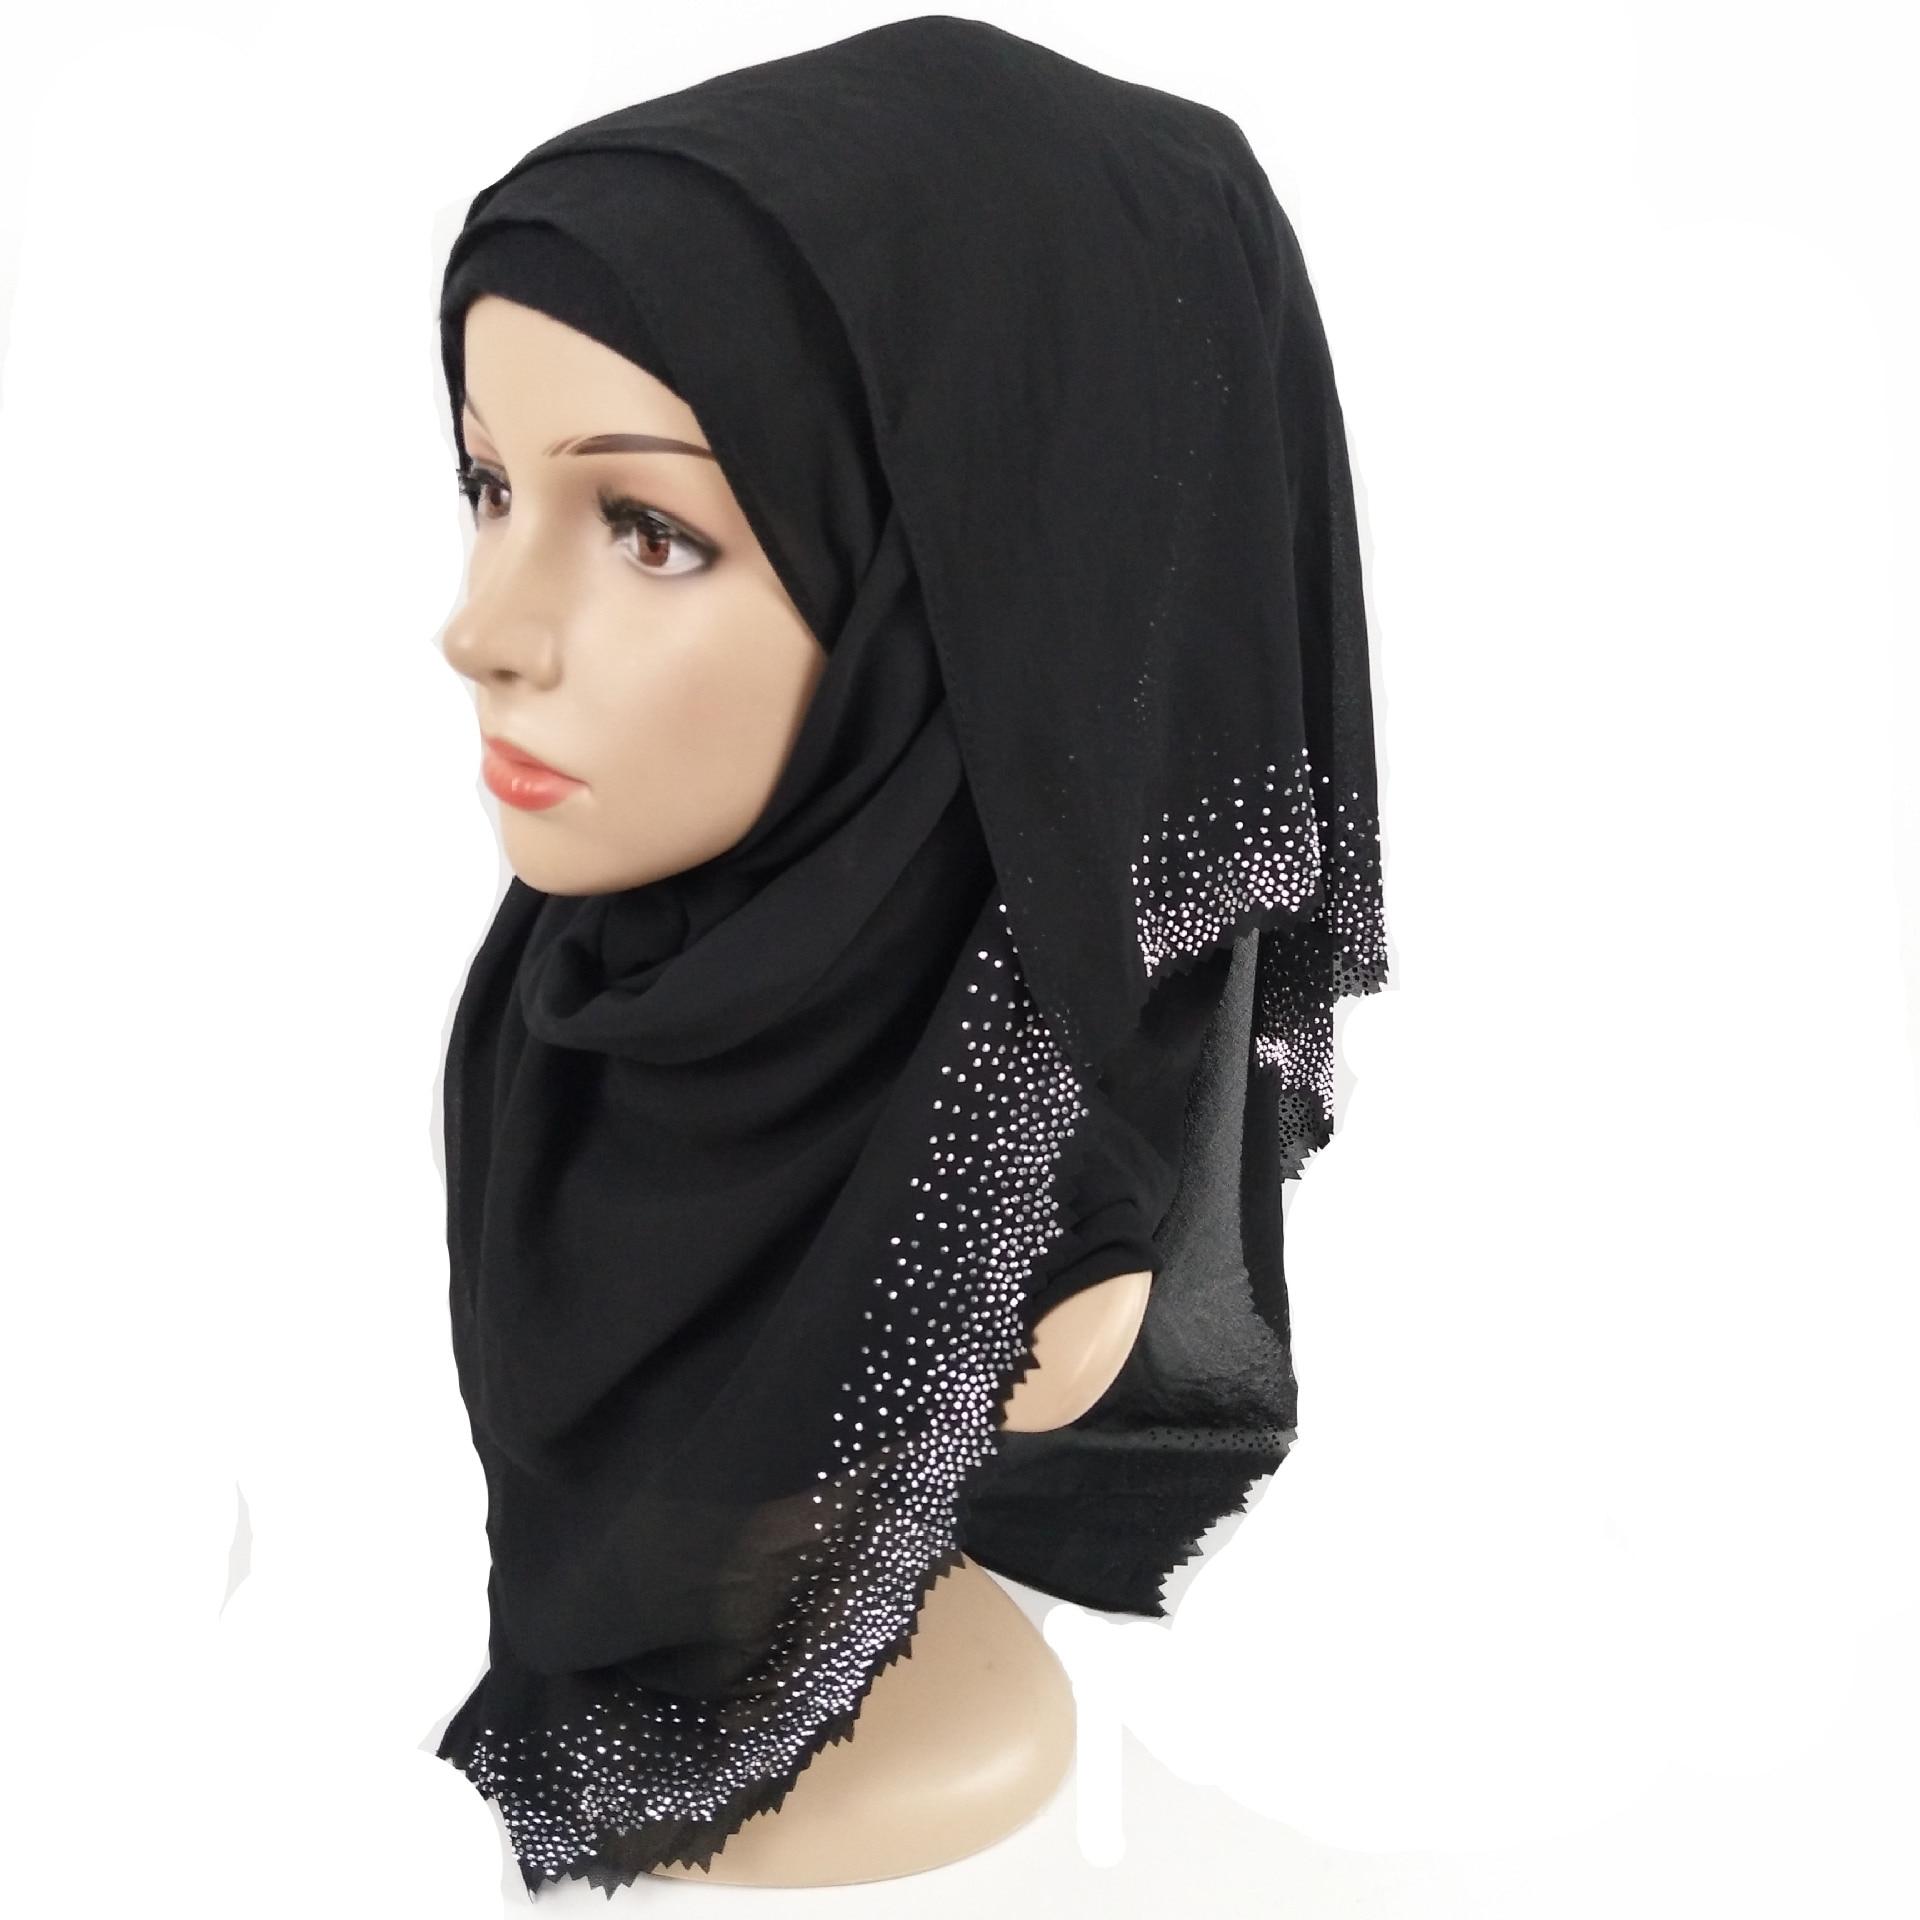 Image 3 - New Hollow Hot Diamond Pearl Chiffon Headscarf Muslim Hijab Long Towel Malaysian ShawlIslamic Clothing